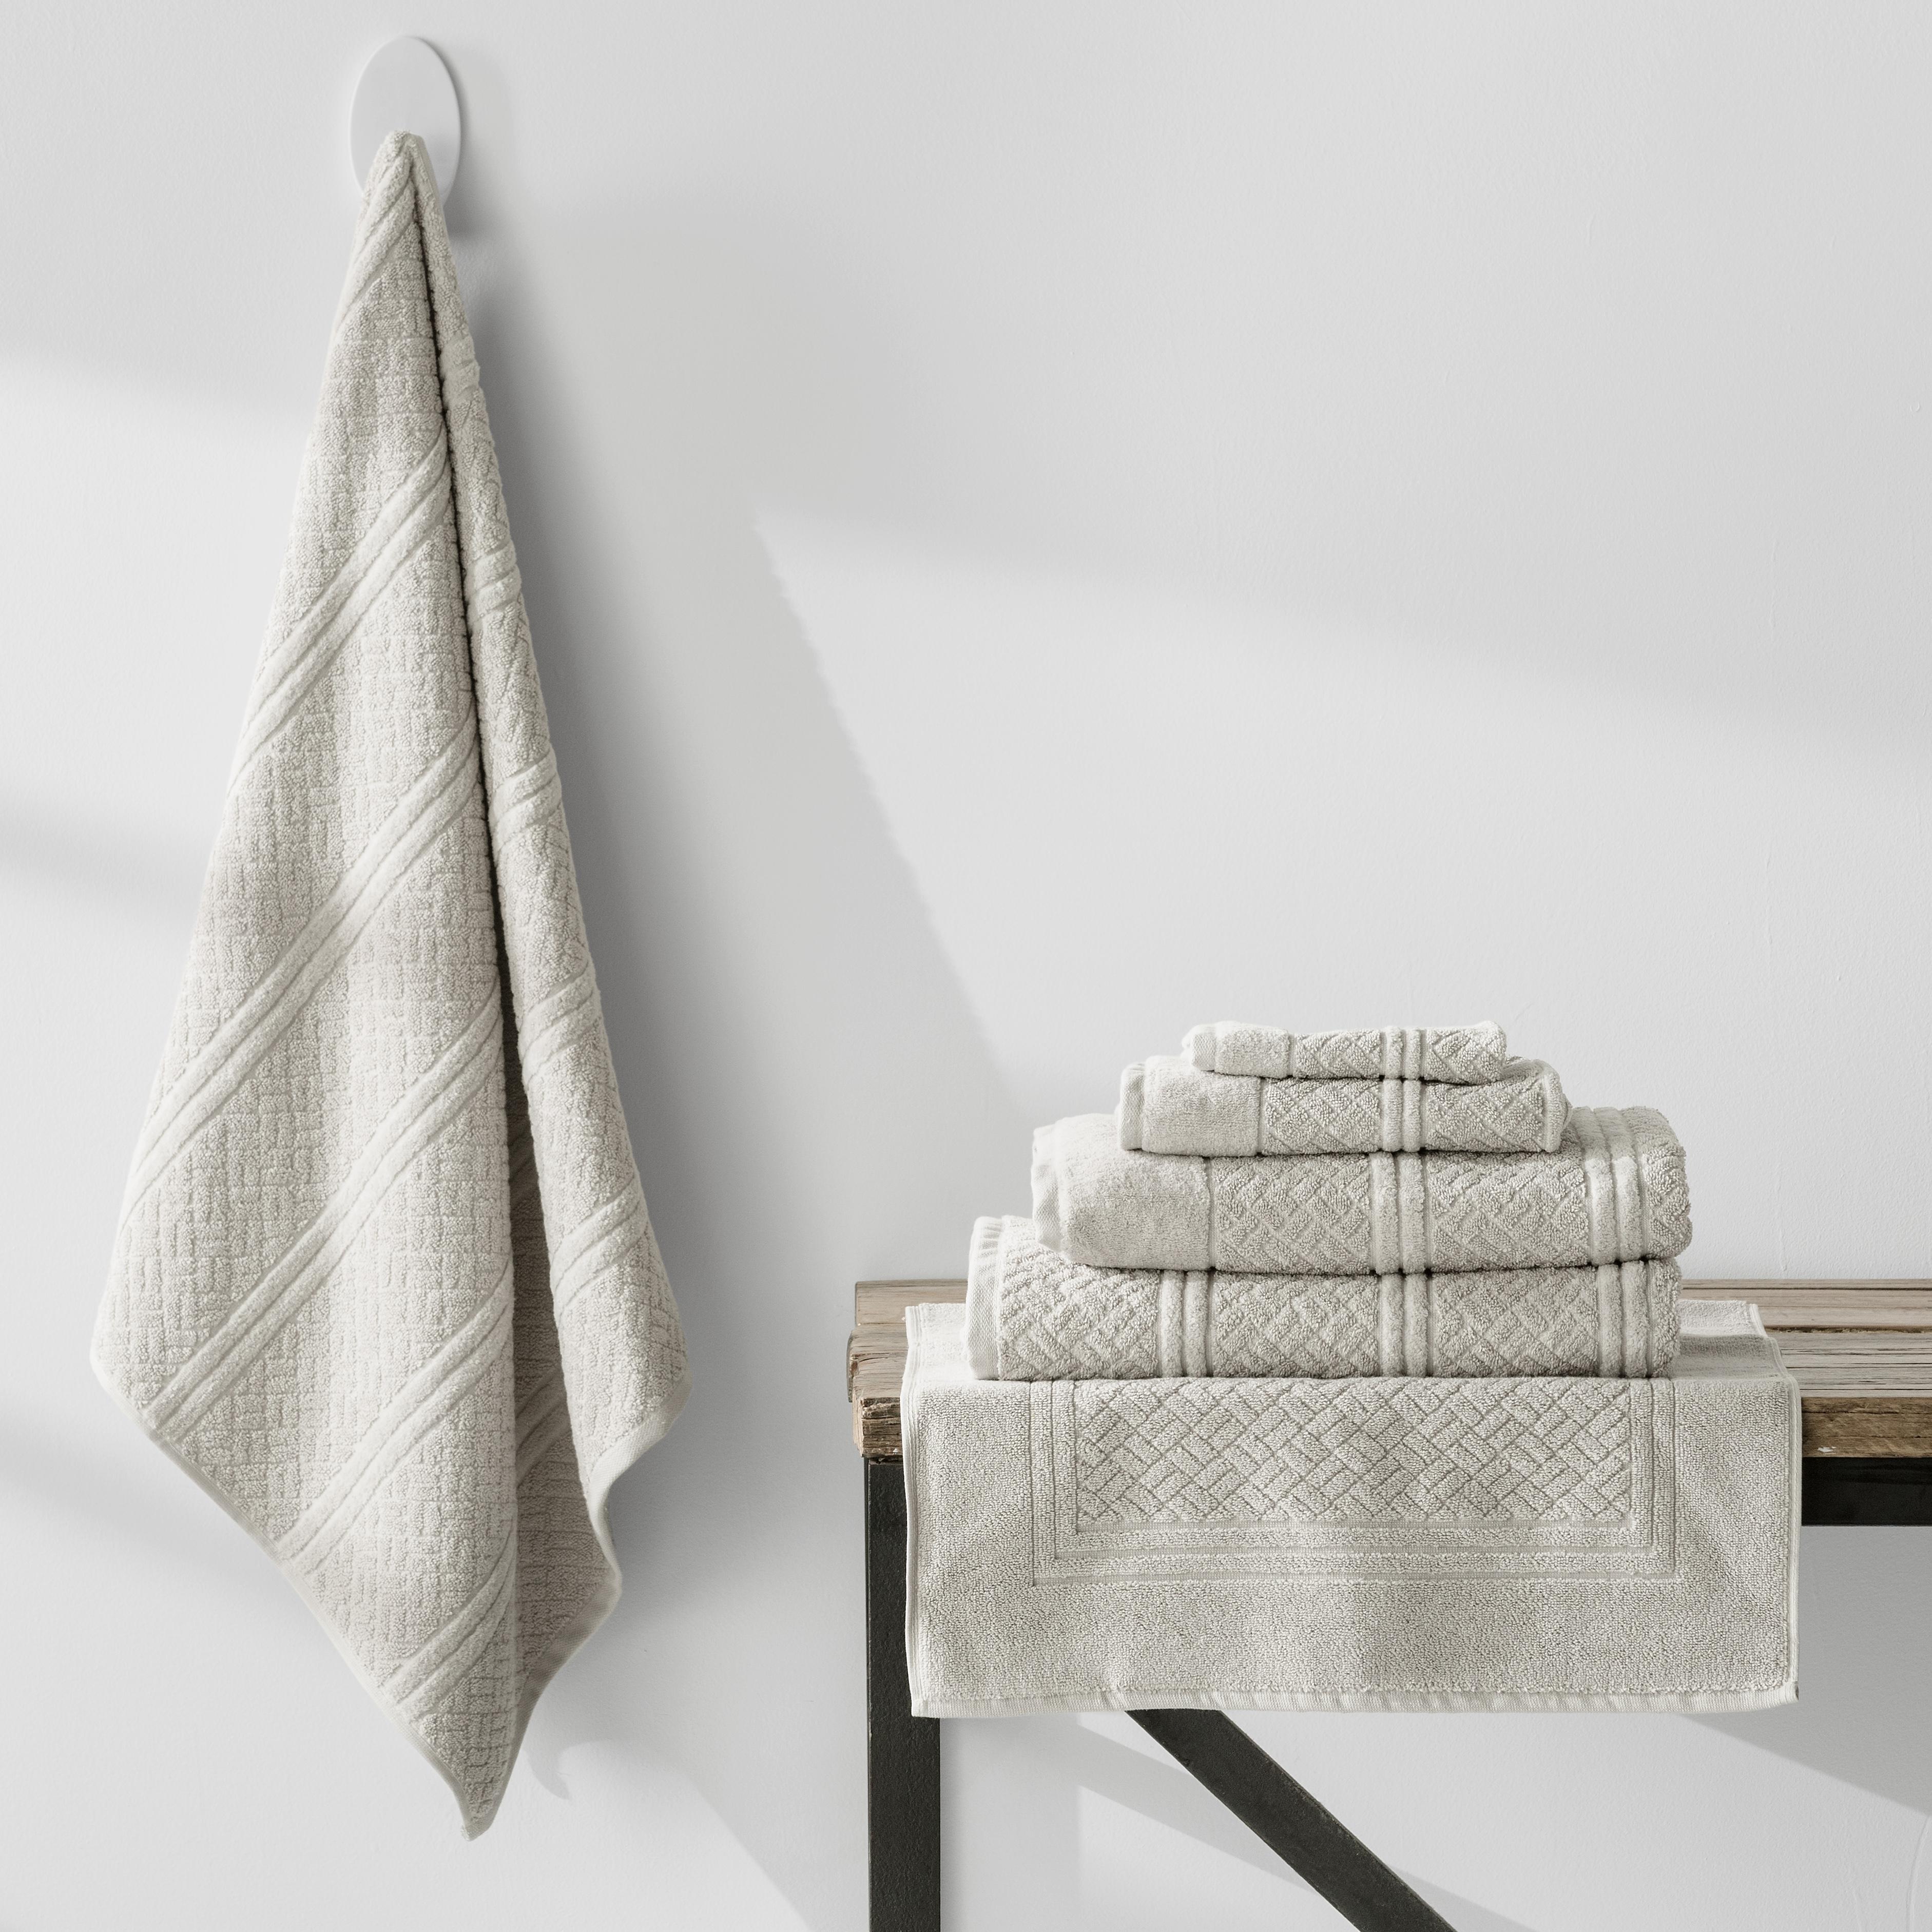 7 Piece Turkish Cotton Towels Jaquard  Weave | Stone